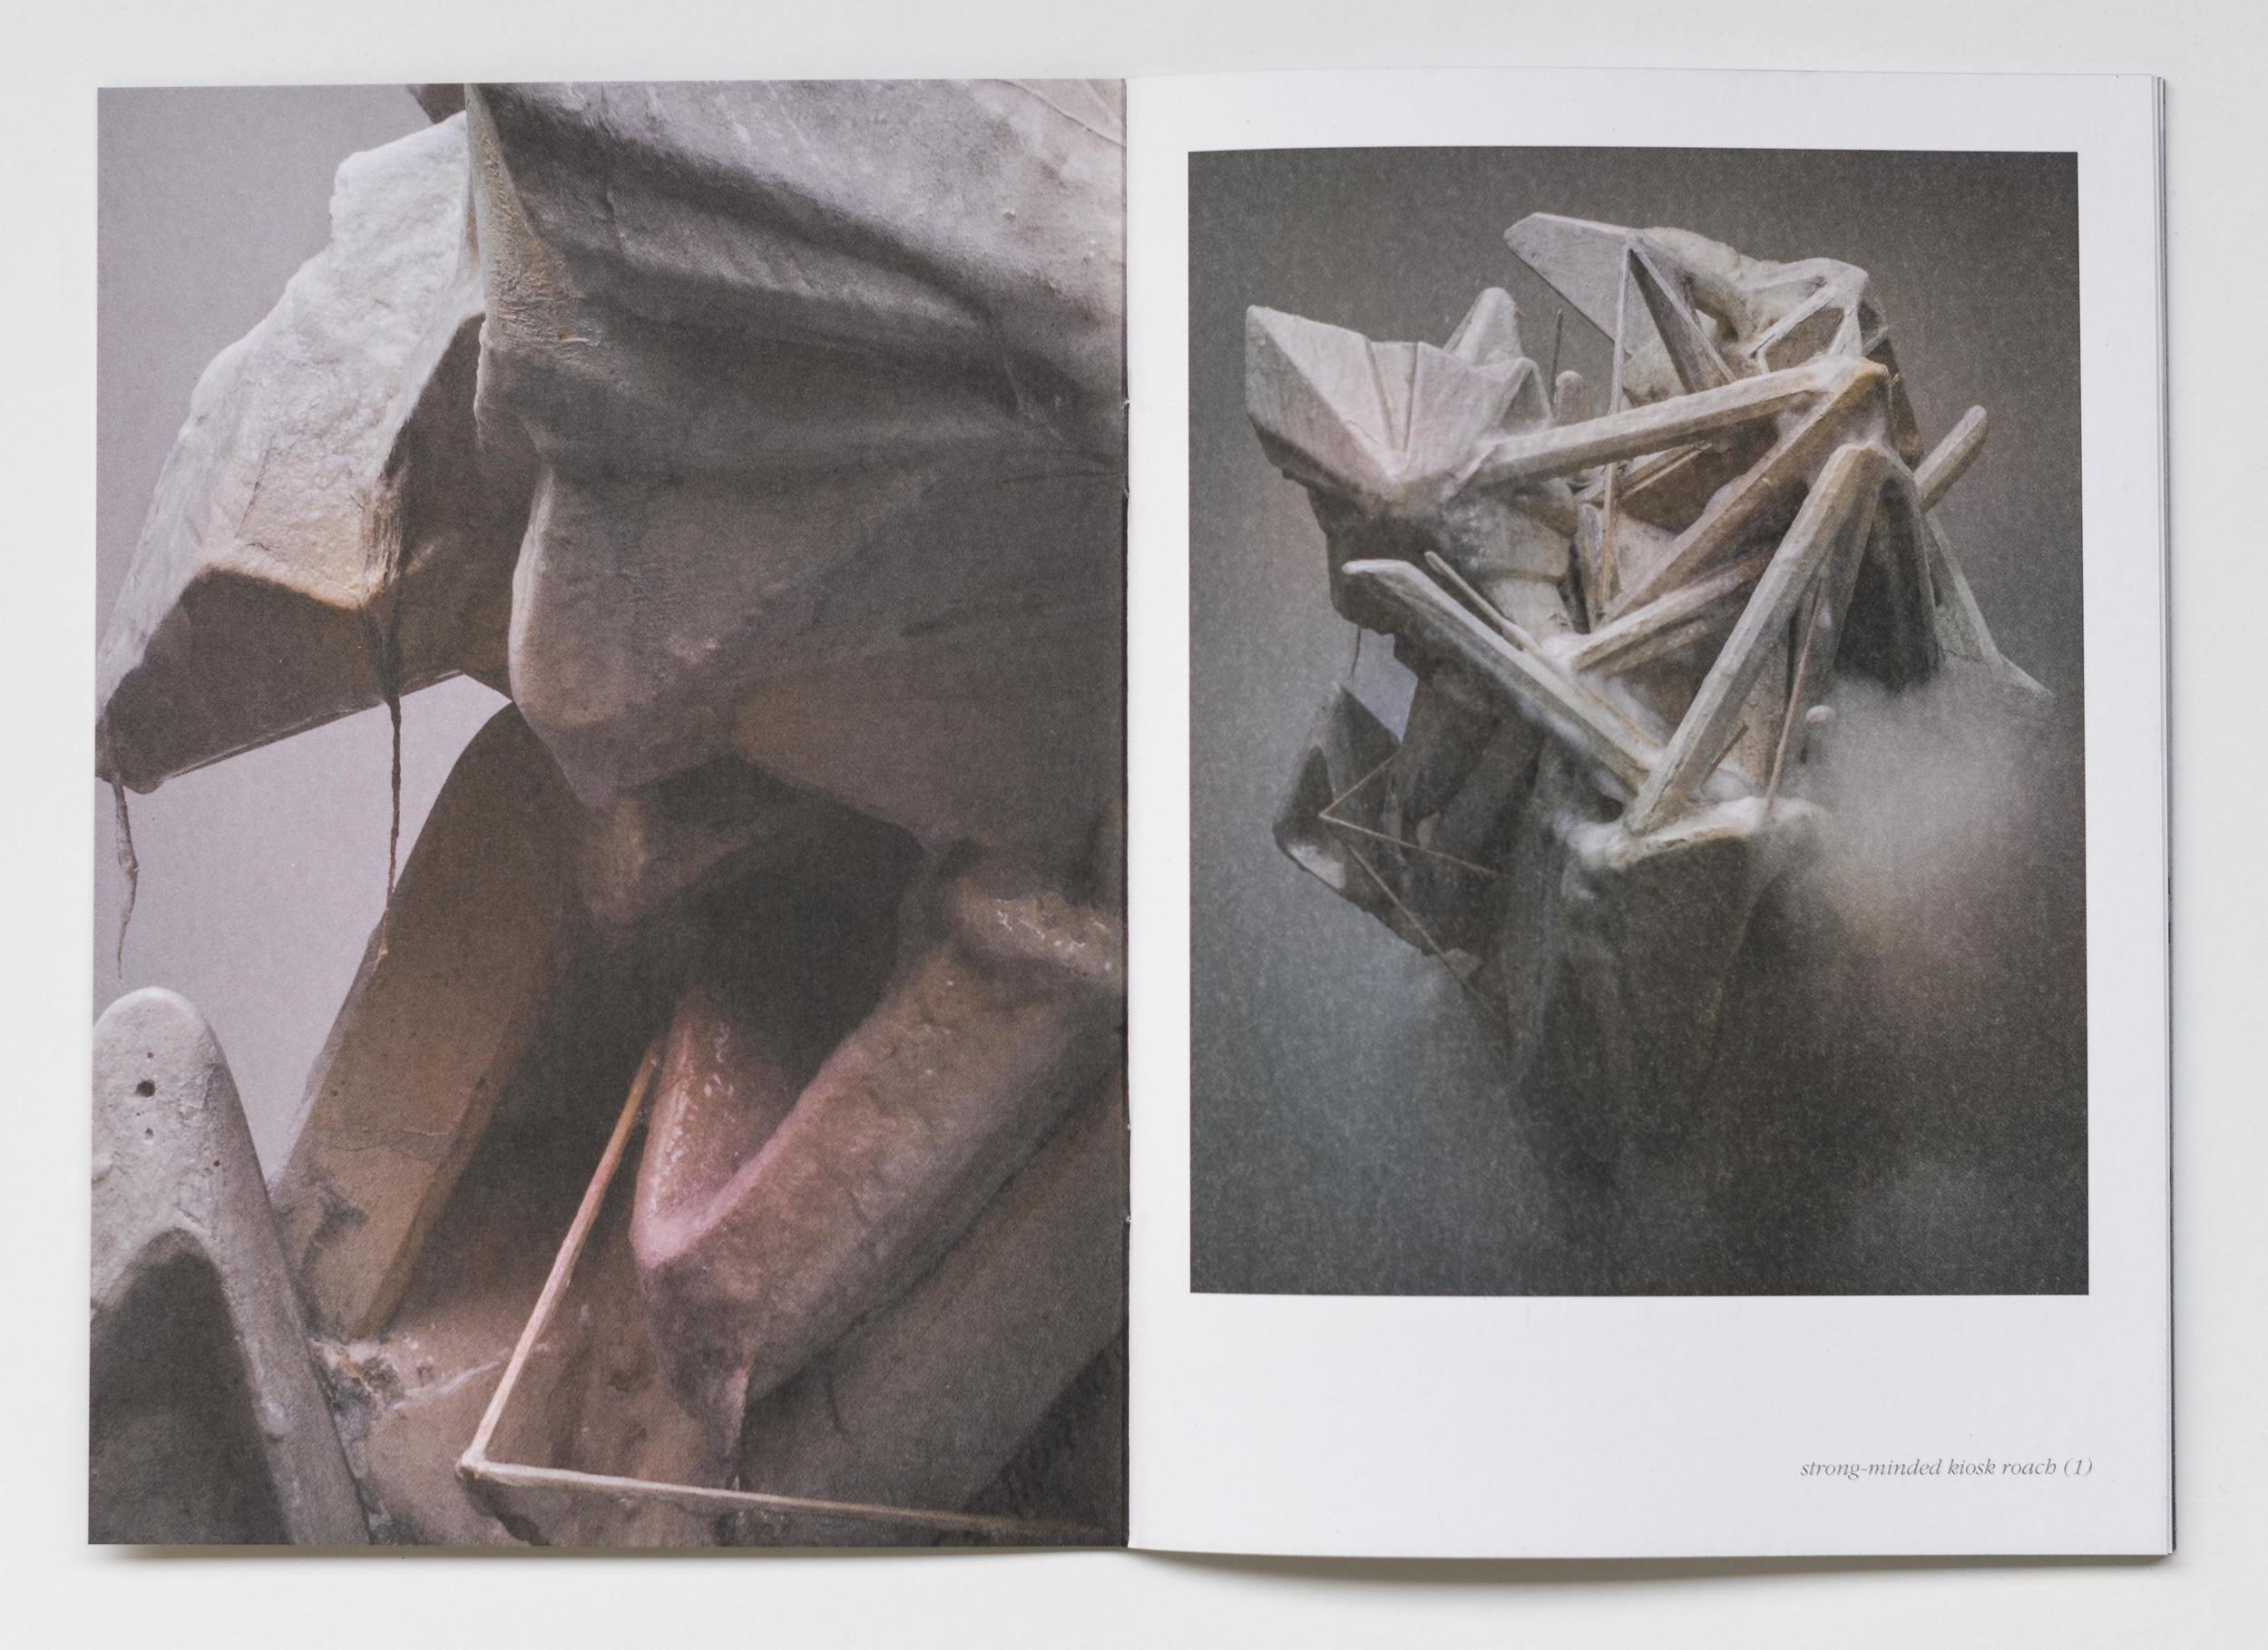 michael kutschbach mad odor roses catalogue-2.jpg